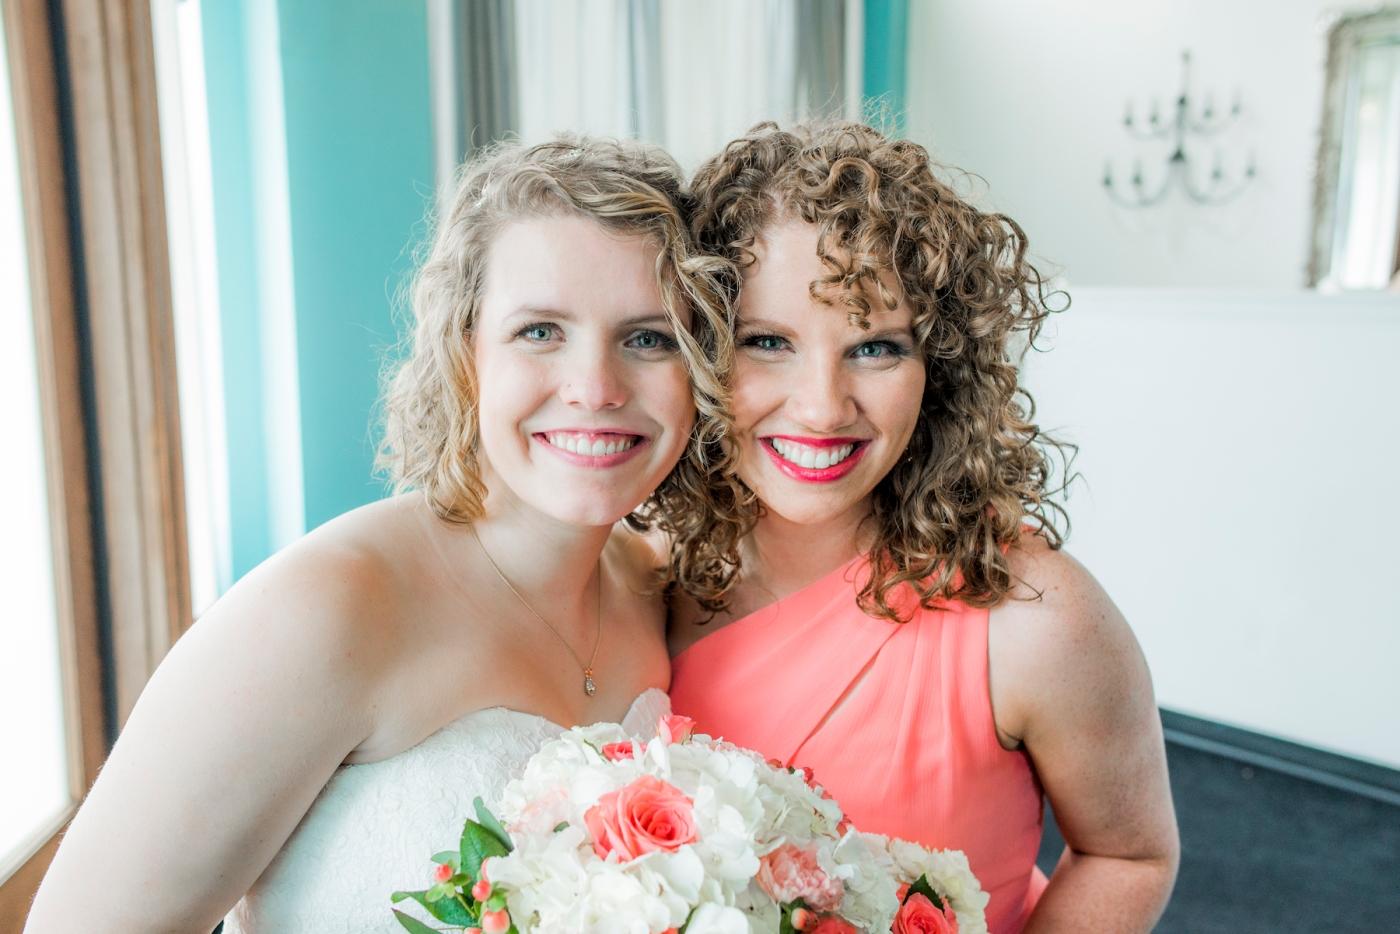 DSC_2841Everett_Wedding_Ballroom_Jane_Speleers_photography_Rachel_and_Edmund_bridesmaids_2017